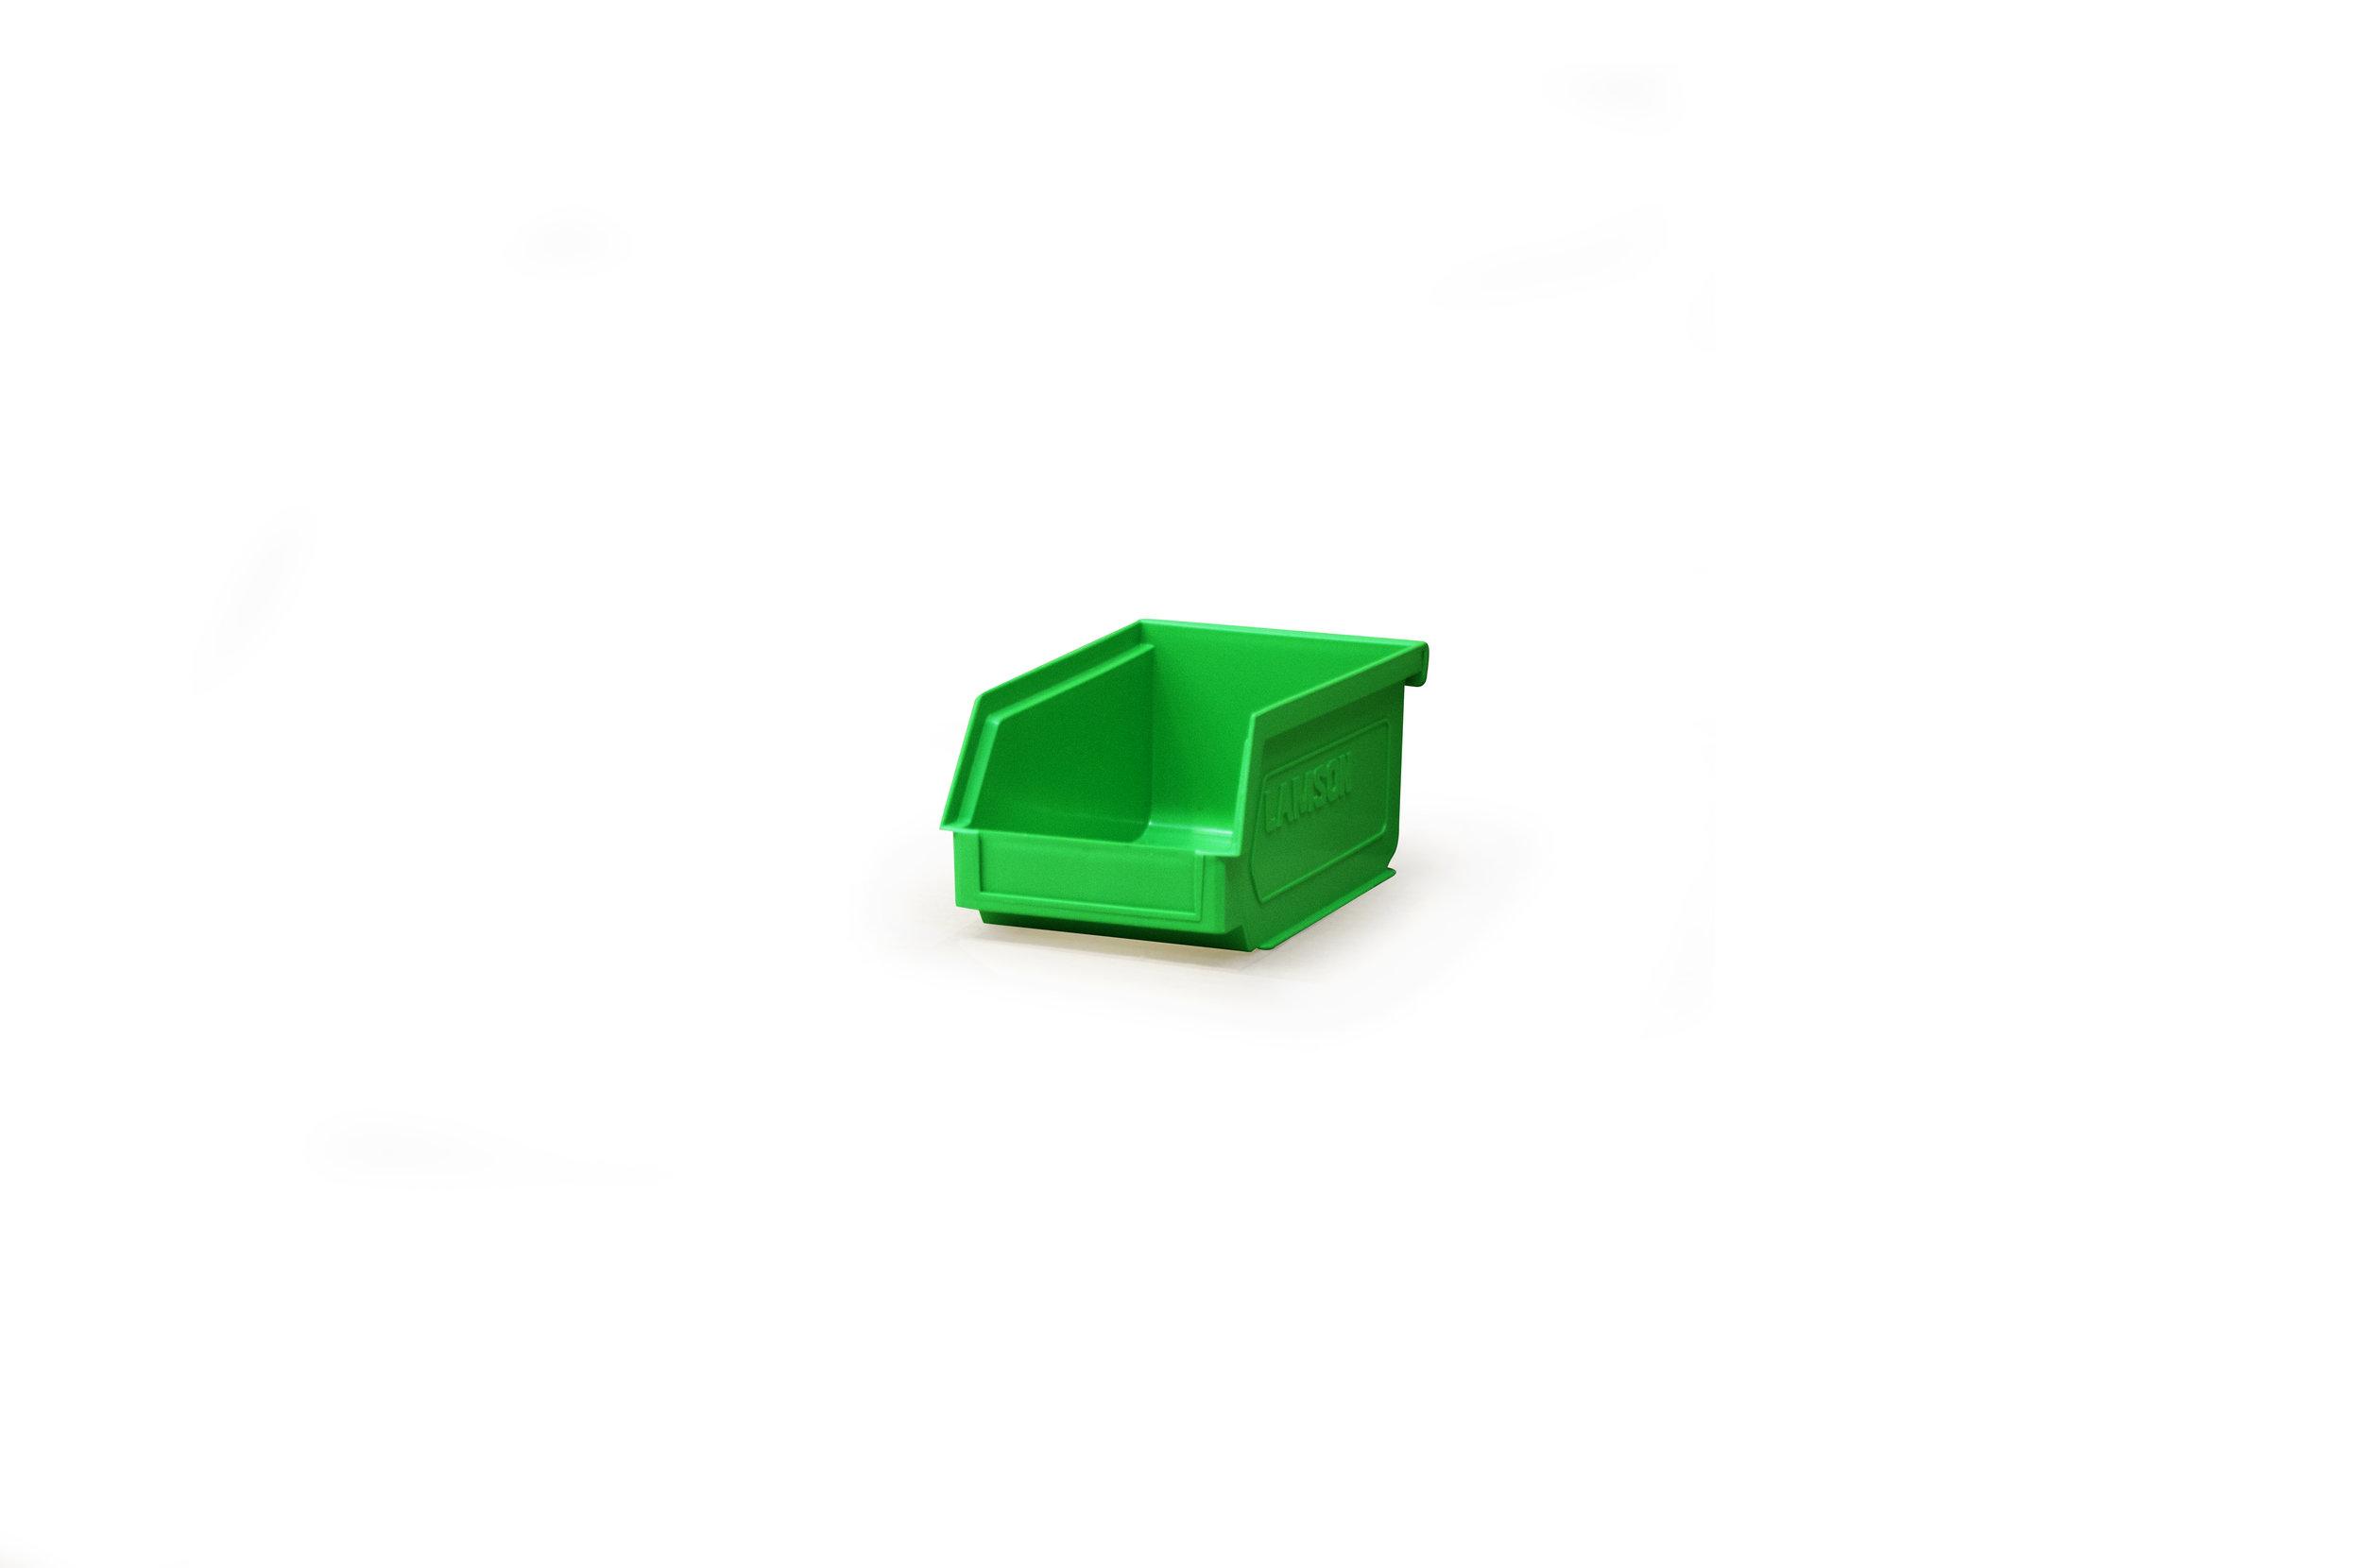 Size 5 Green (Image 1).jpg